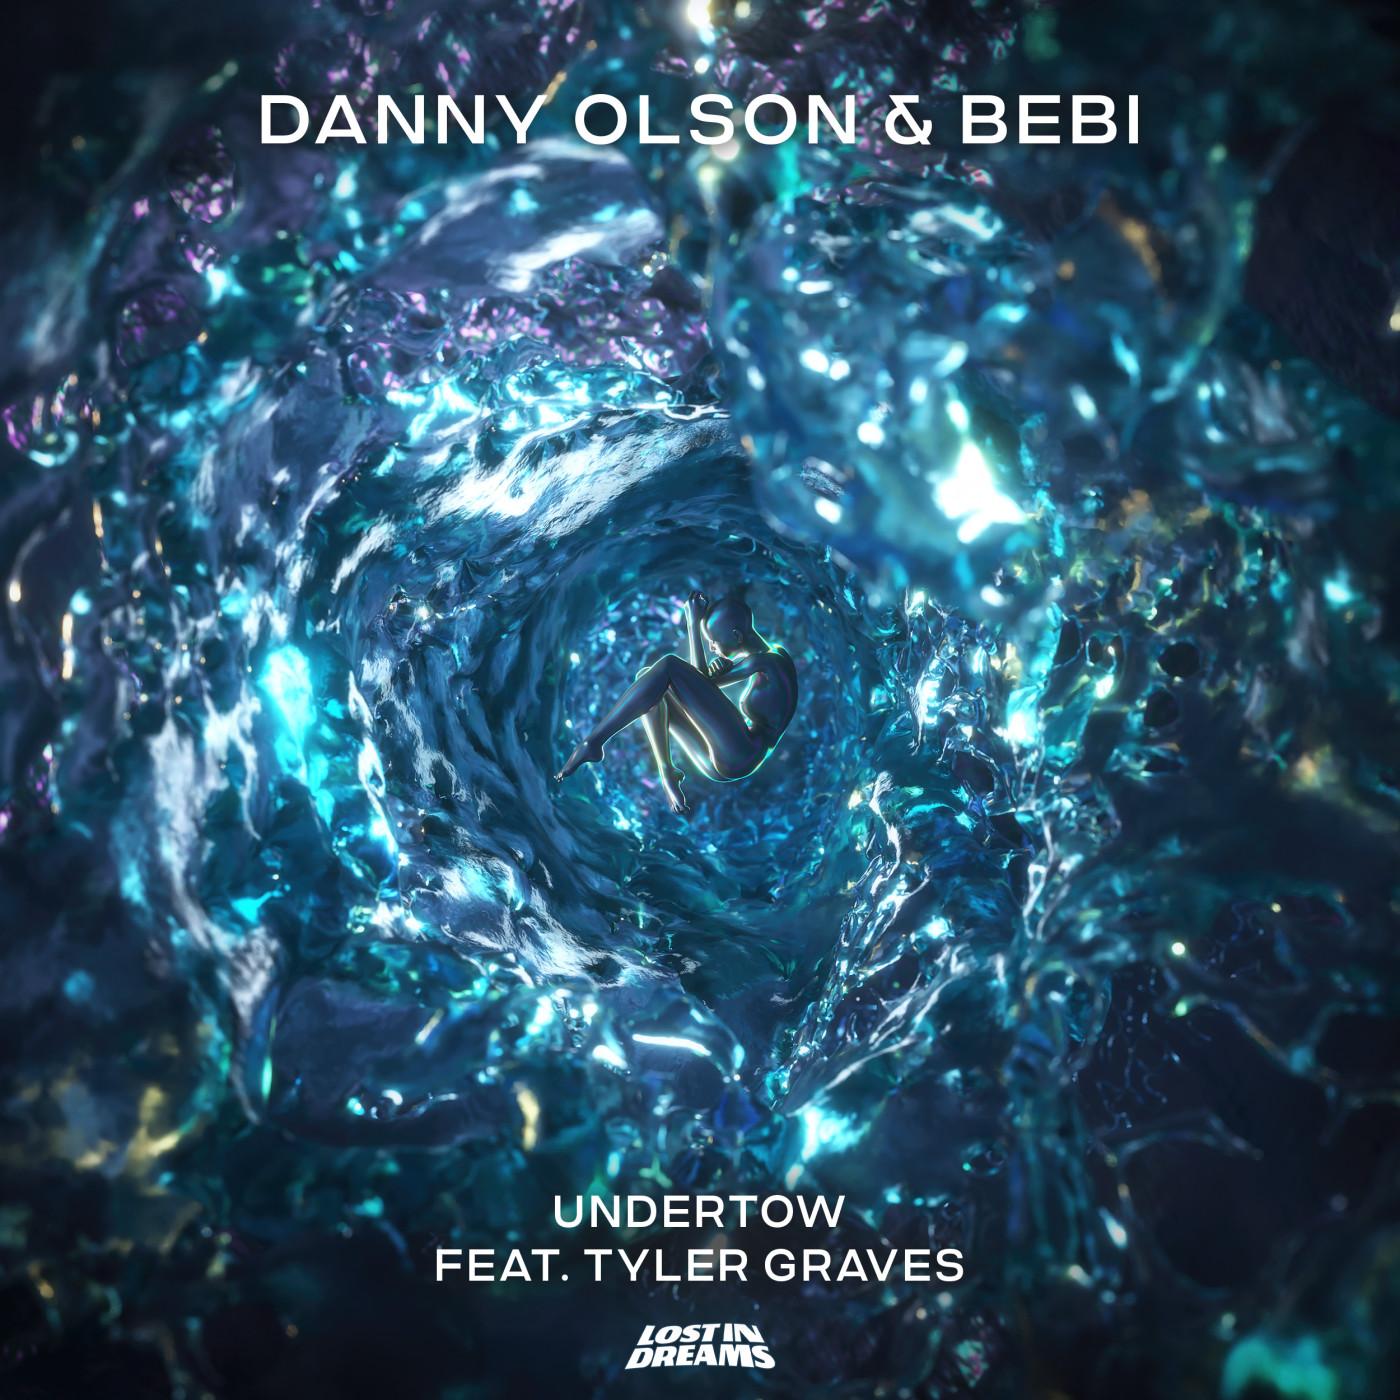 Danny Olson, Bebi & Tyler Graves - Undertow